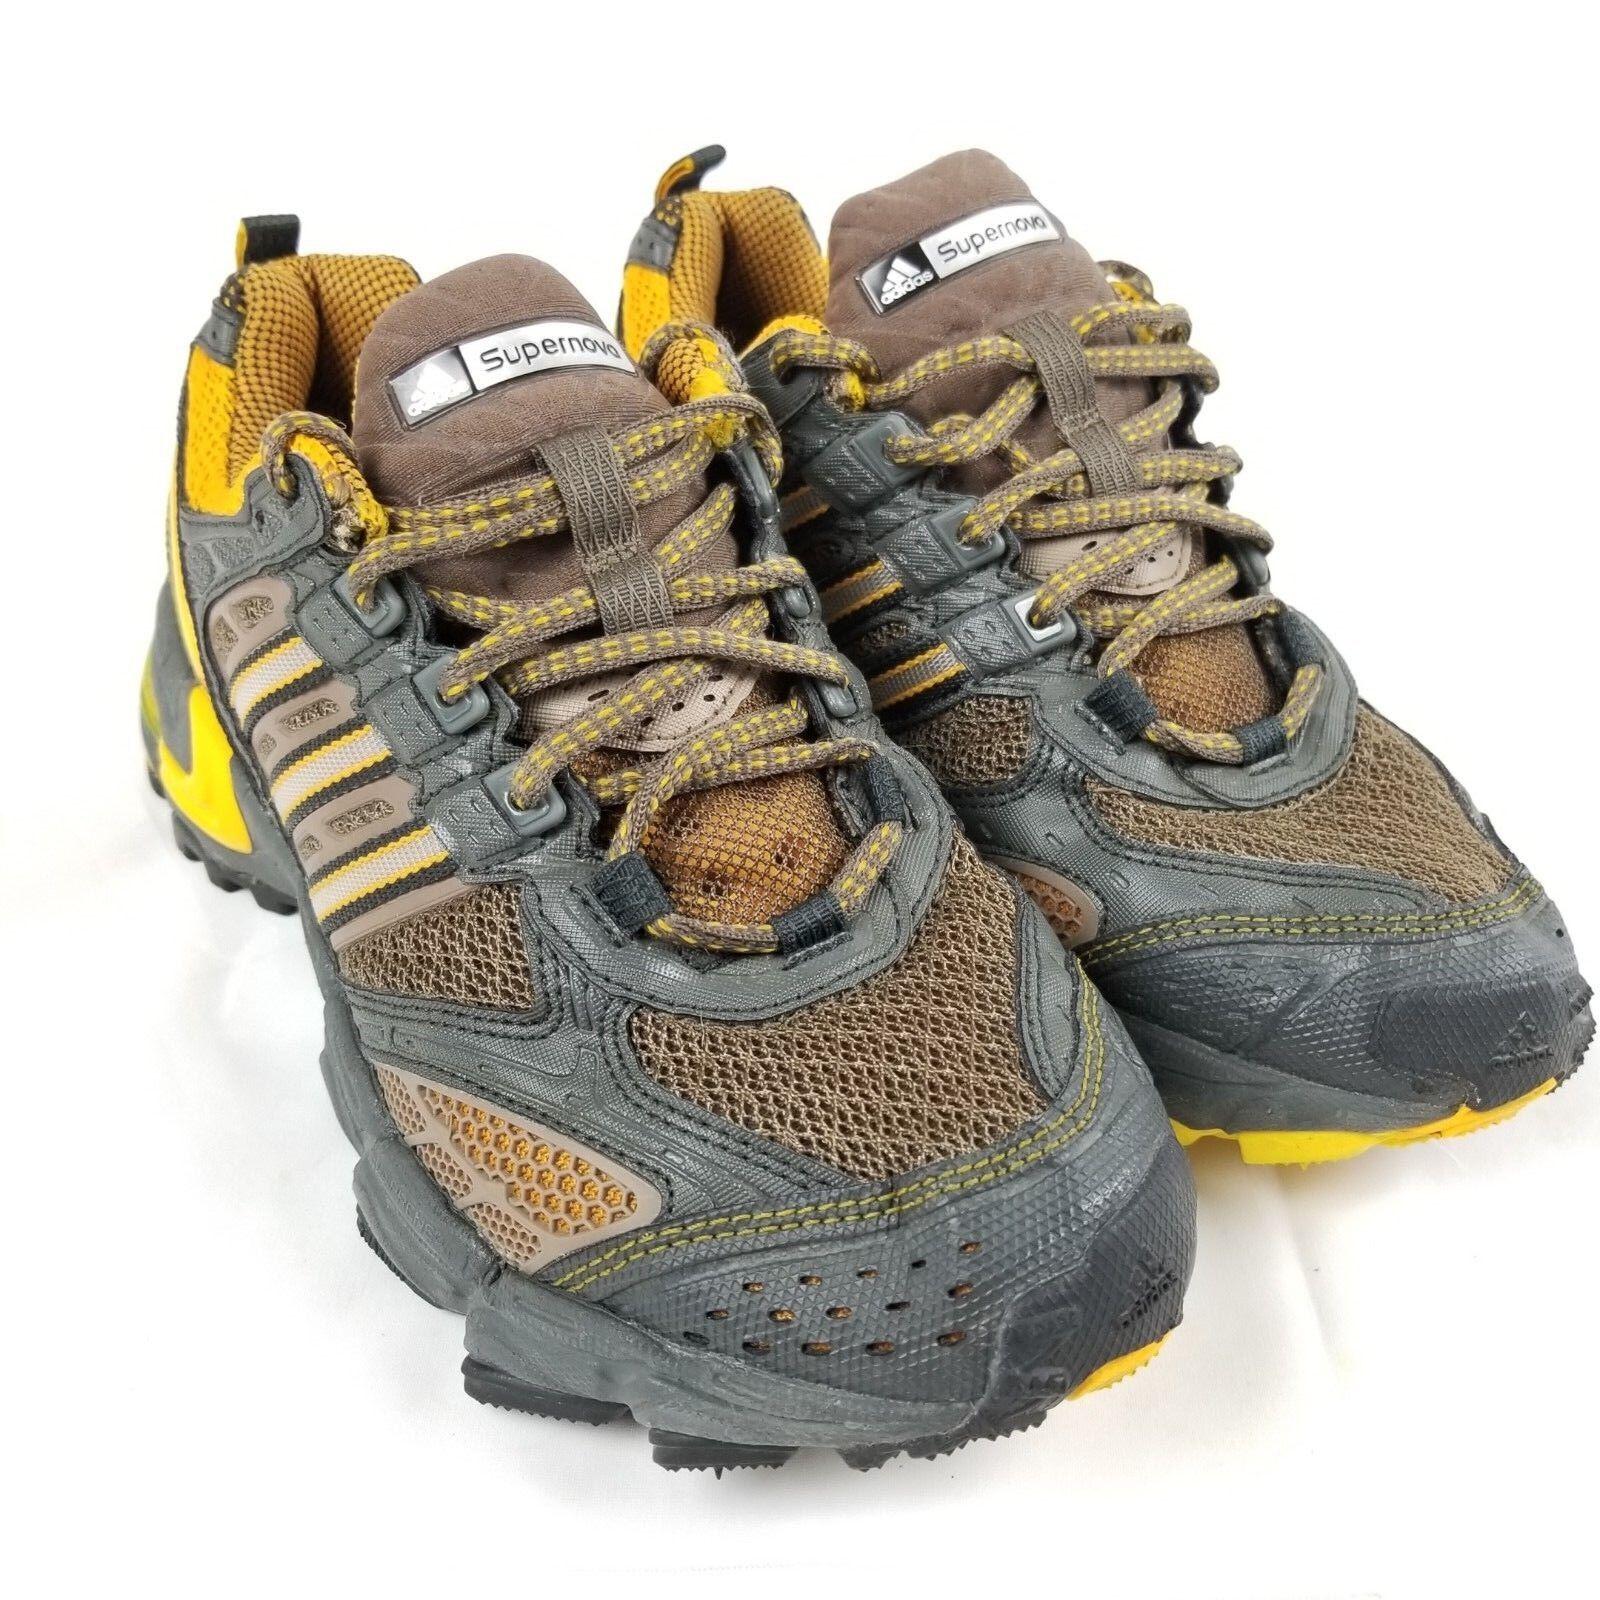 ADIDAS Supernova Formotion Men Sz 7 Brown gold Running Training Athletic shoes